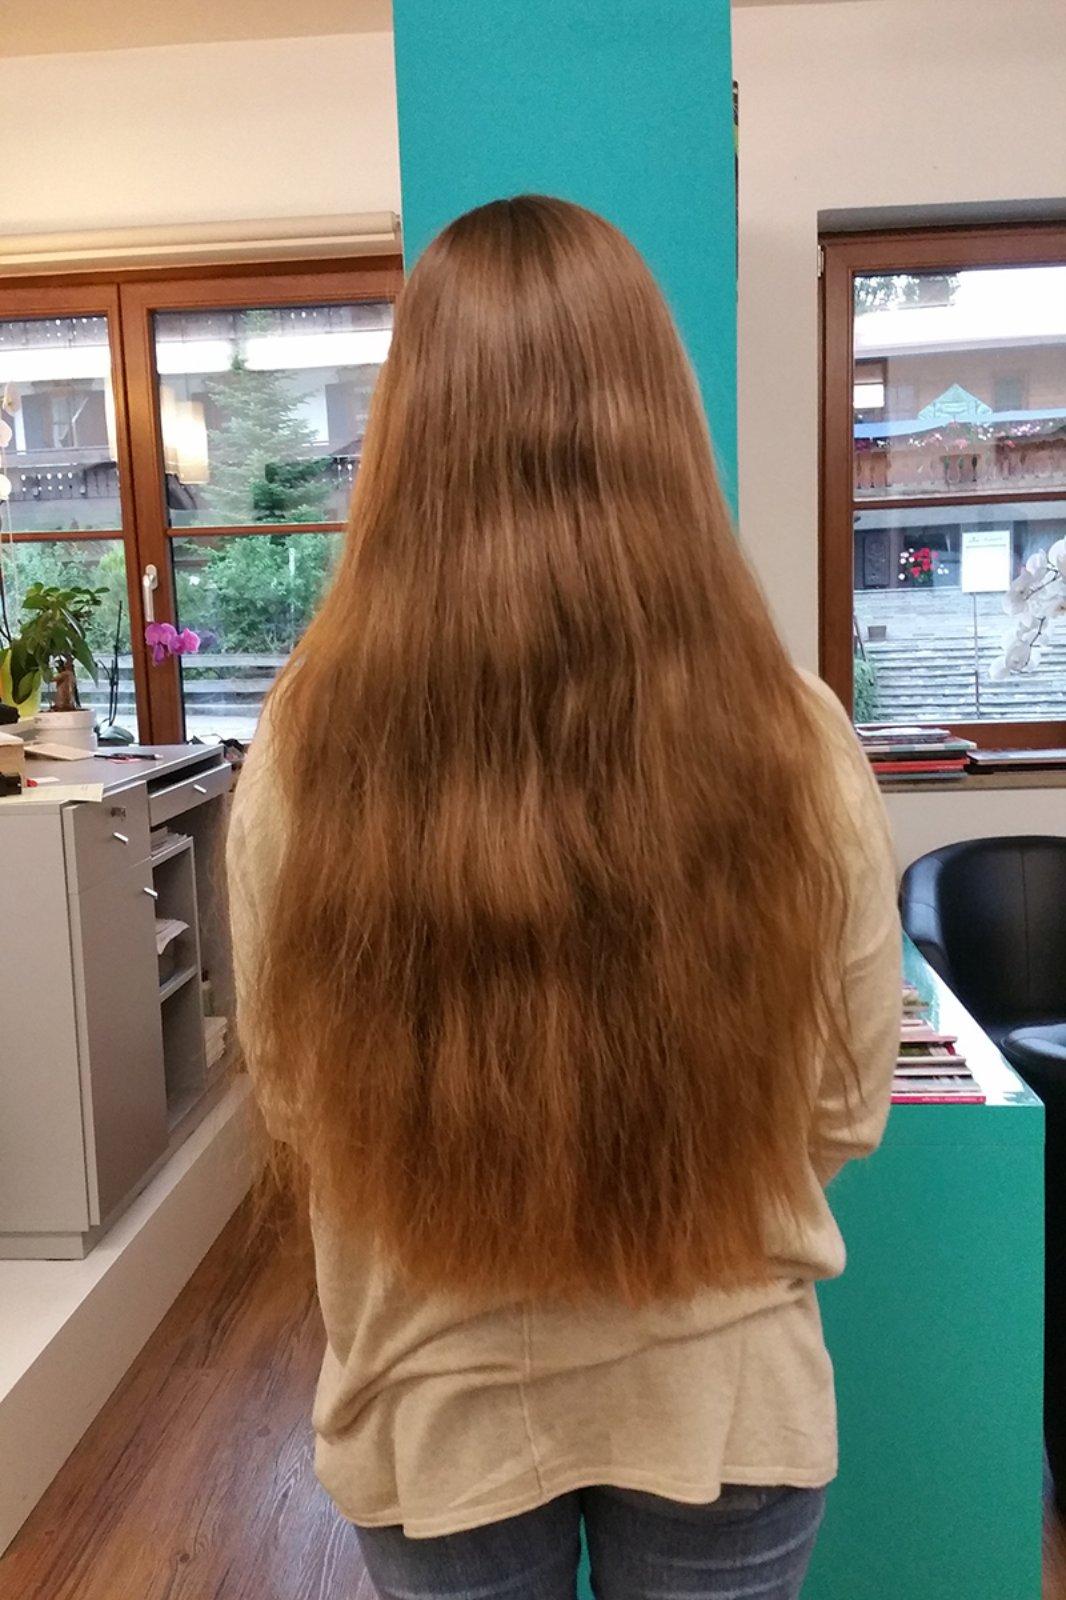 Haarspende Friseursalon Wunderhaar